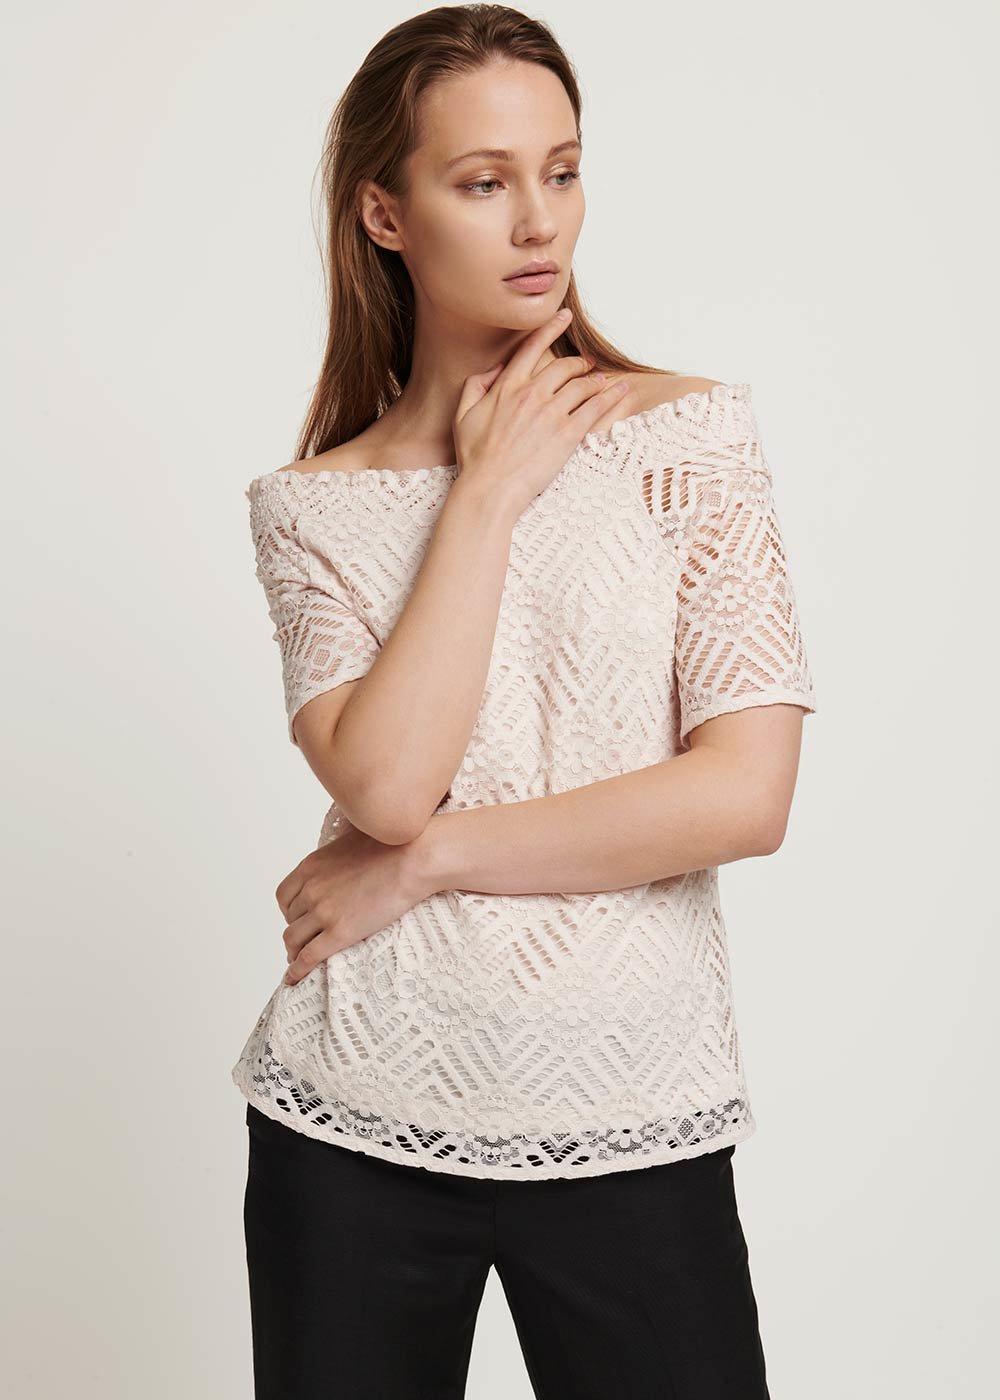 T-shirt Stefania in pizzo - Light Beige - Donna